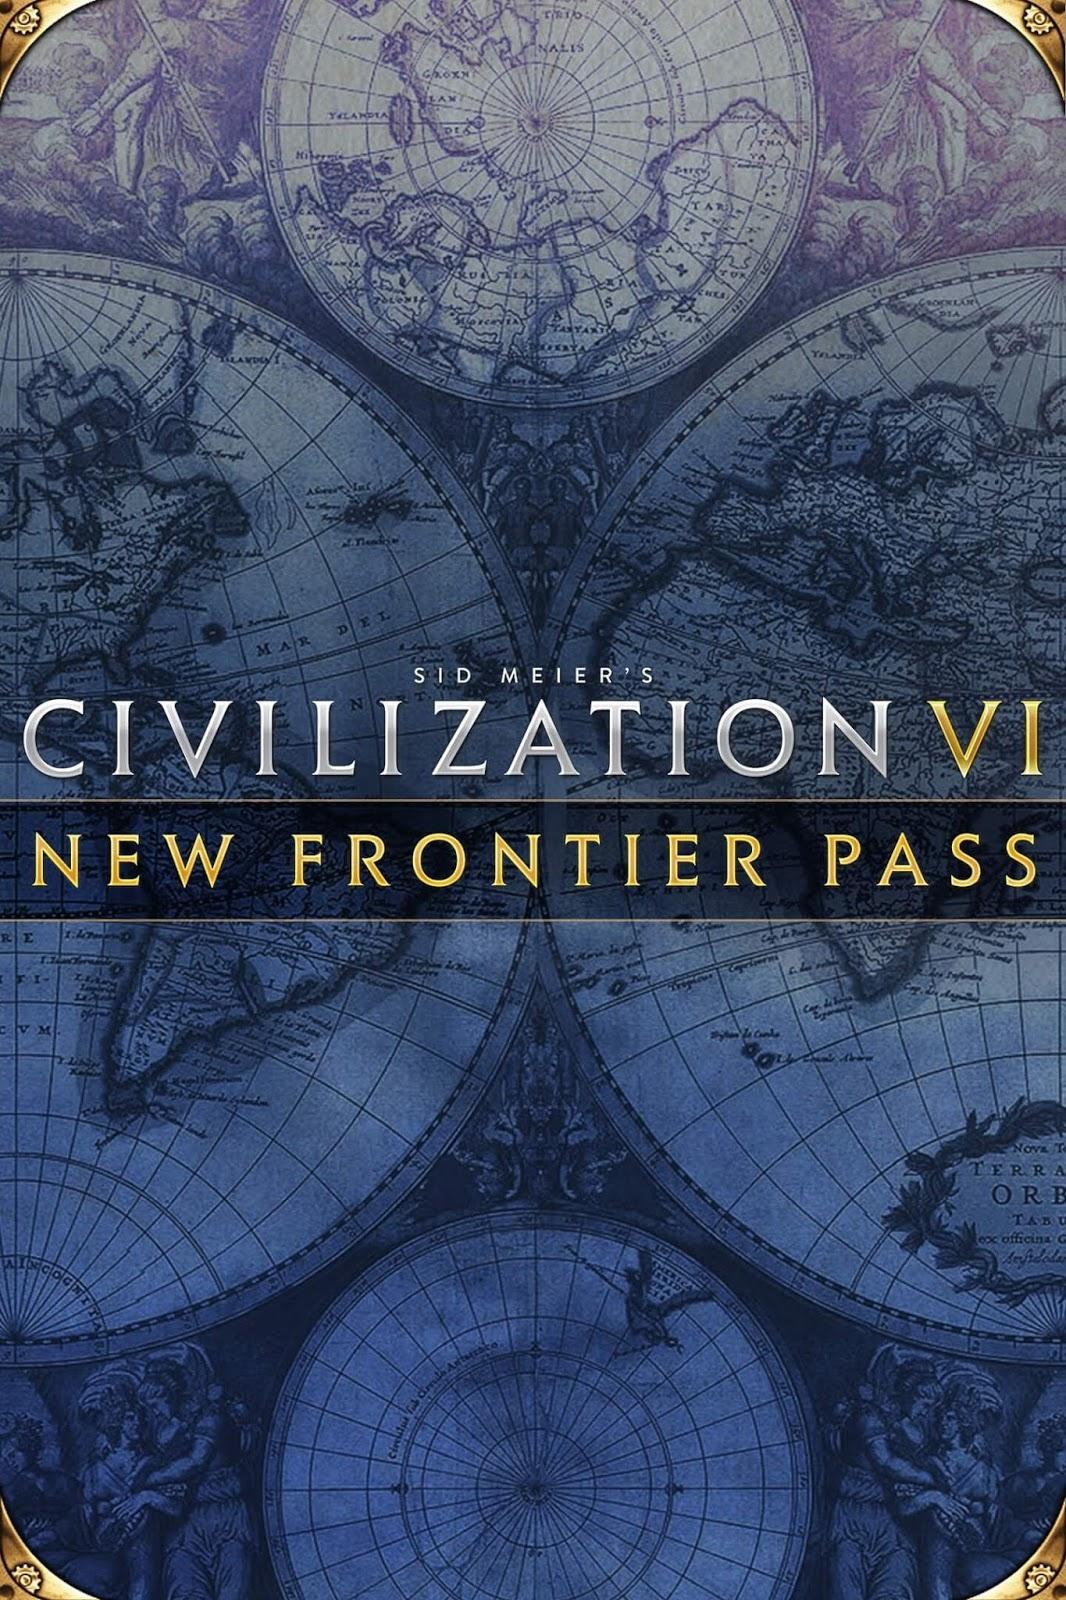 تحميل لعبة Sid Meiers Civilization VI New Frontier Pass Part 3 v1.0.5.11 للكمبيوتر برابط مباشر